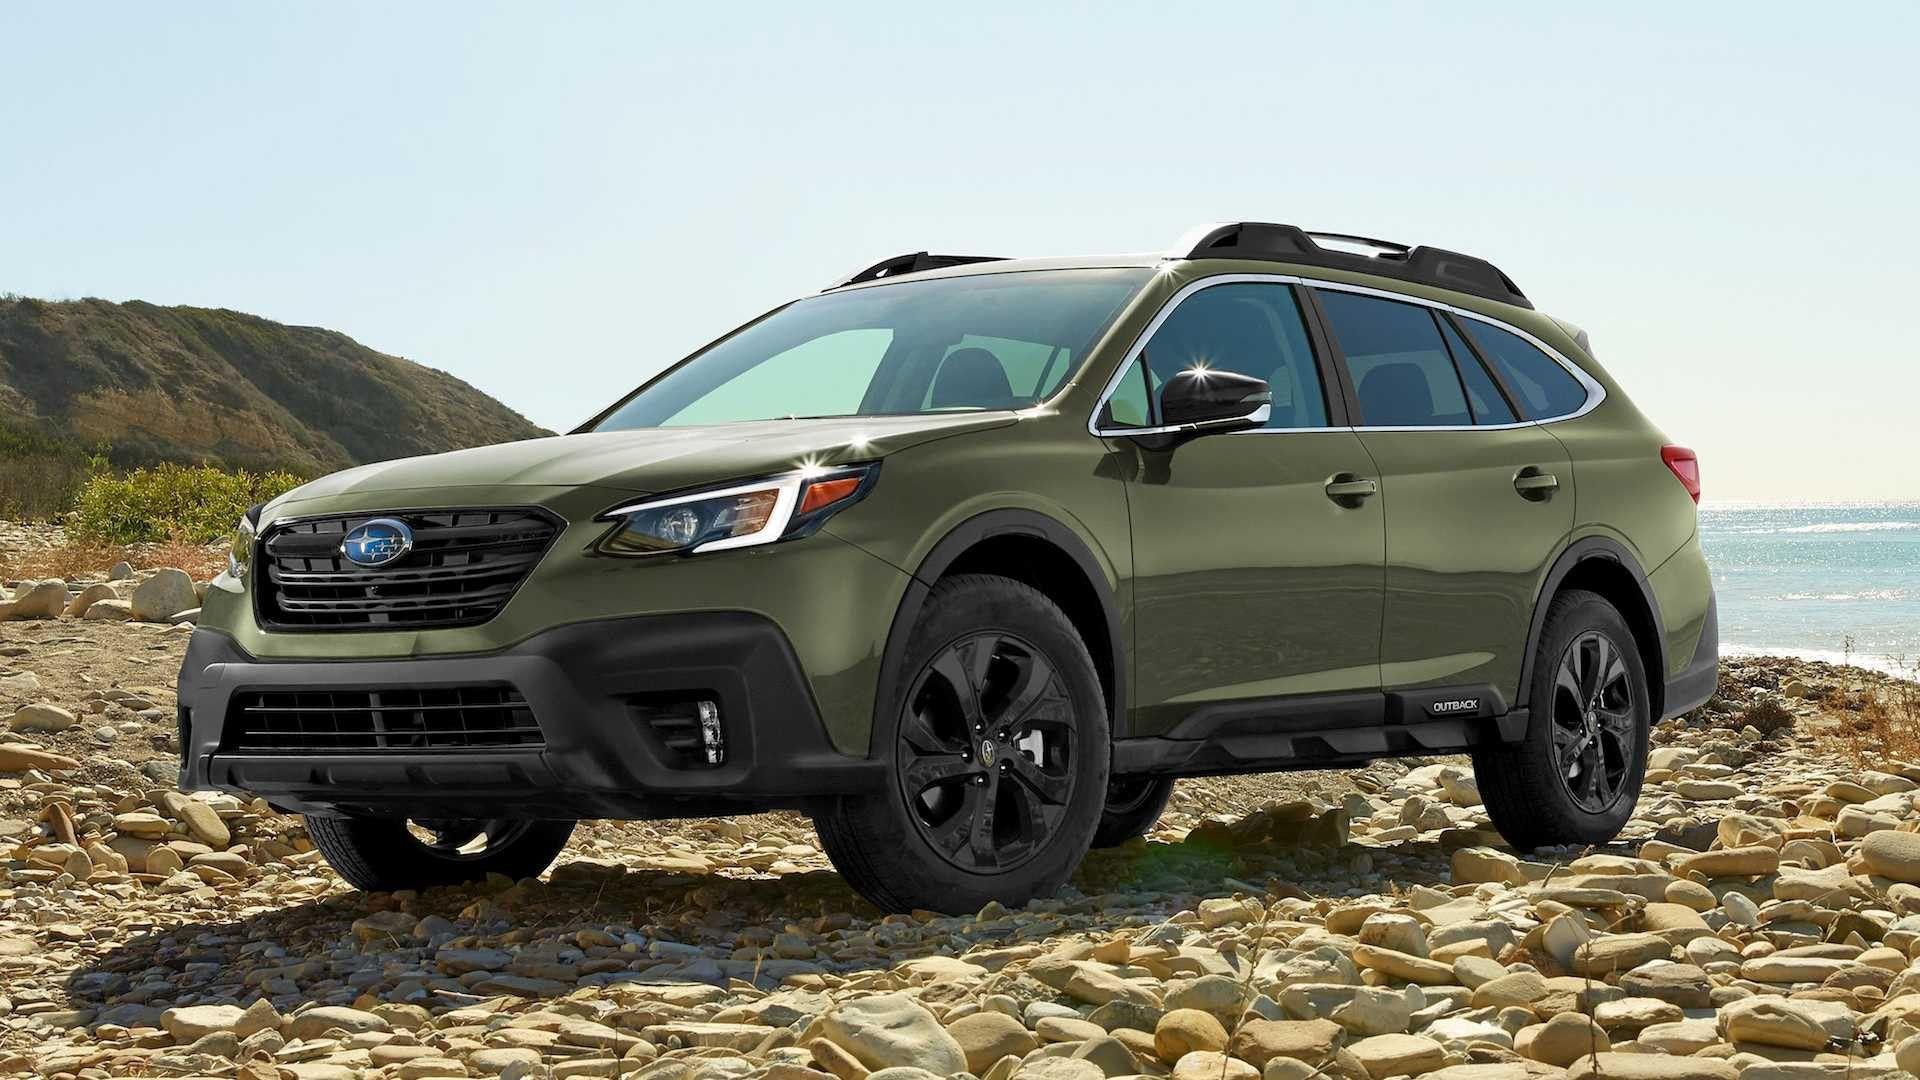 New Generation 2020 Subaru Outback Spy Shoot In 2020 Subaru Outback Subaru Subaru Wrx